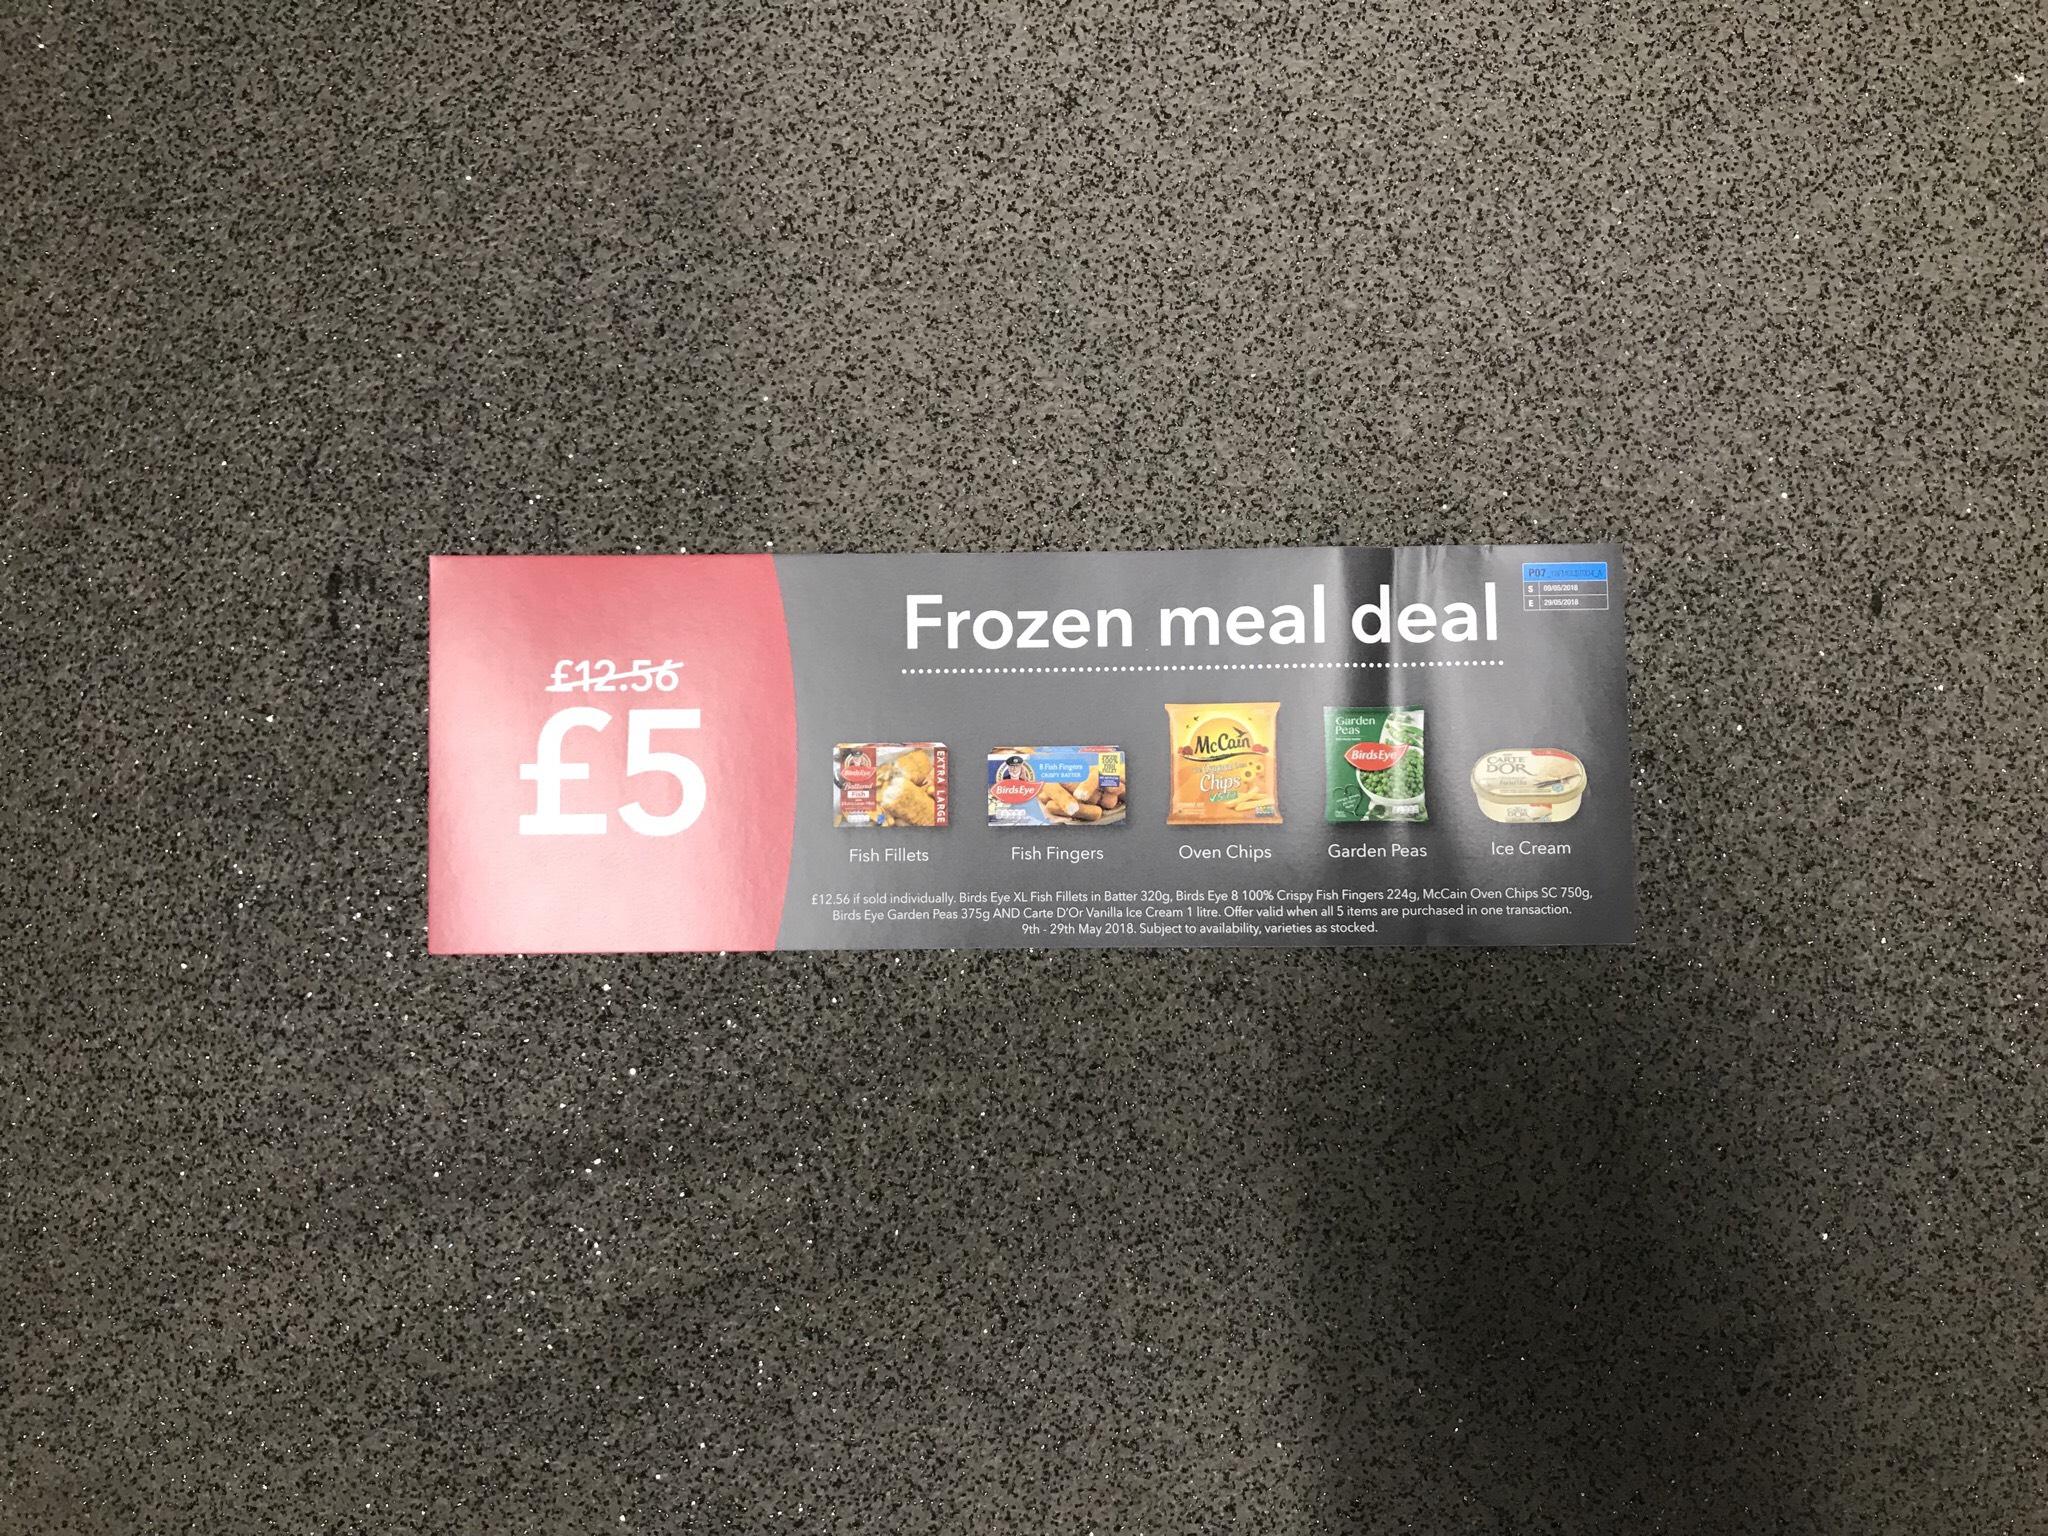 Co op frozen meal deal starts 9/5/18